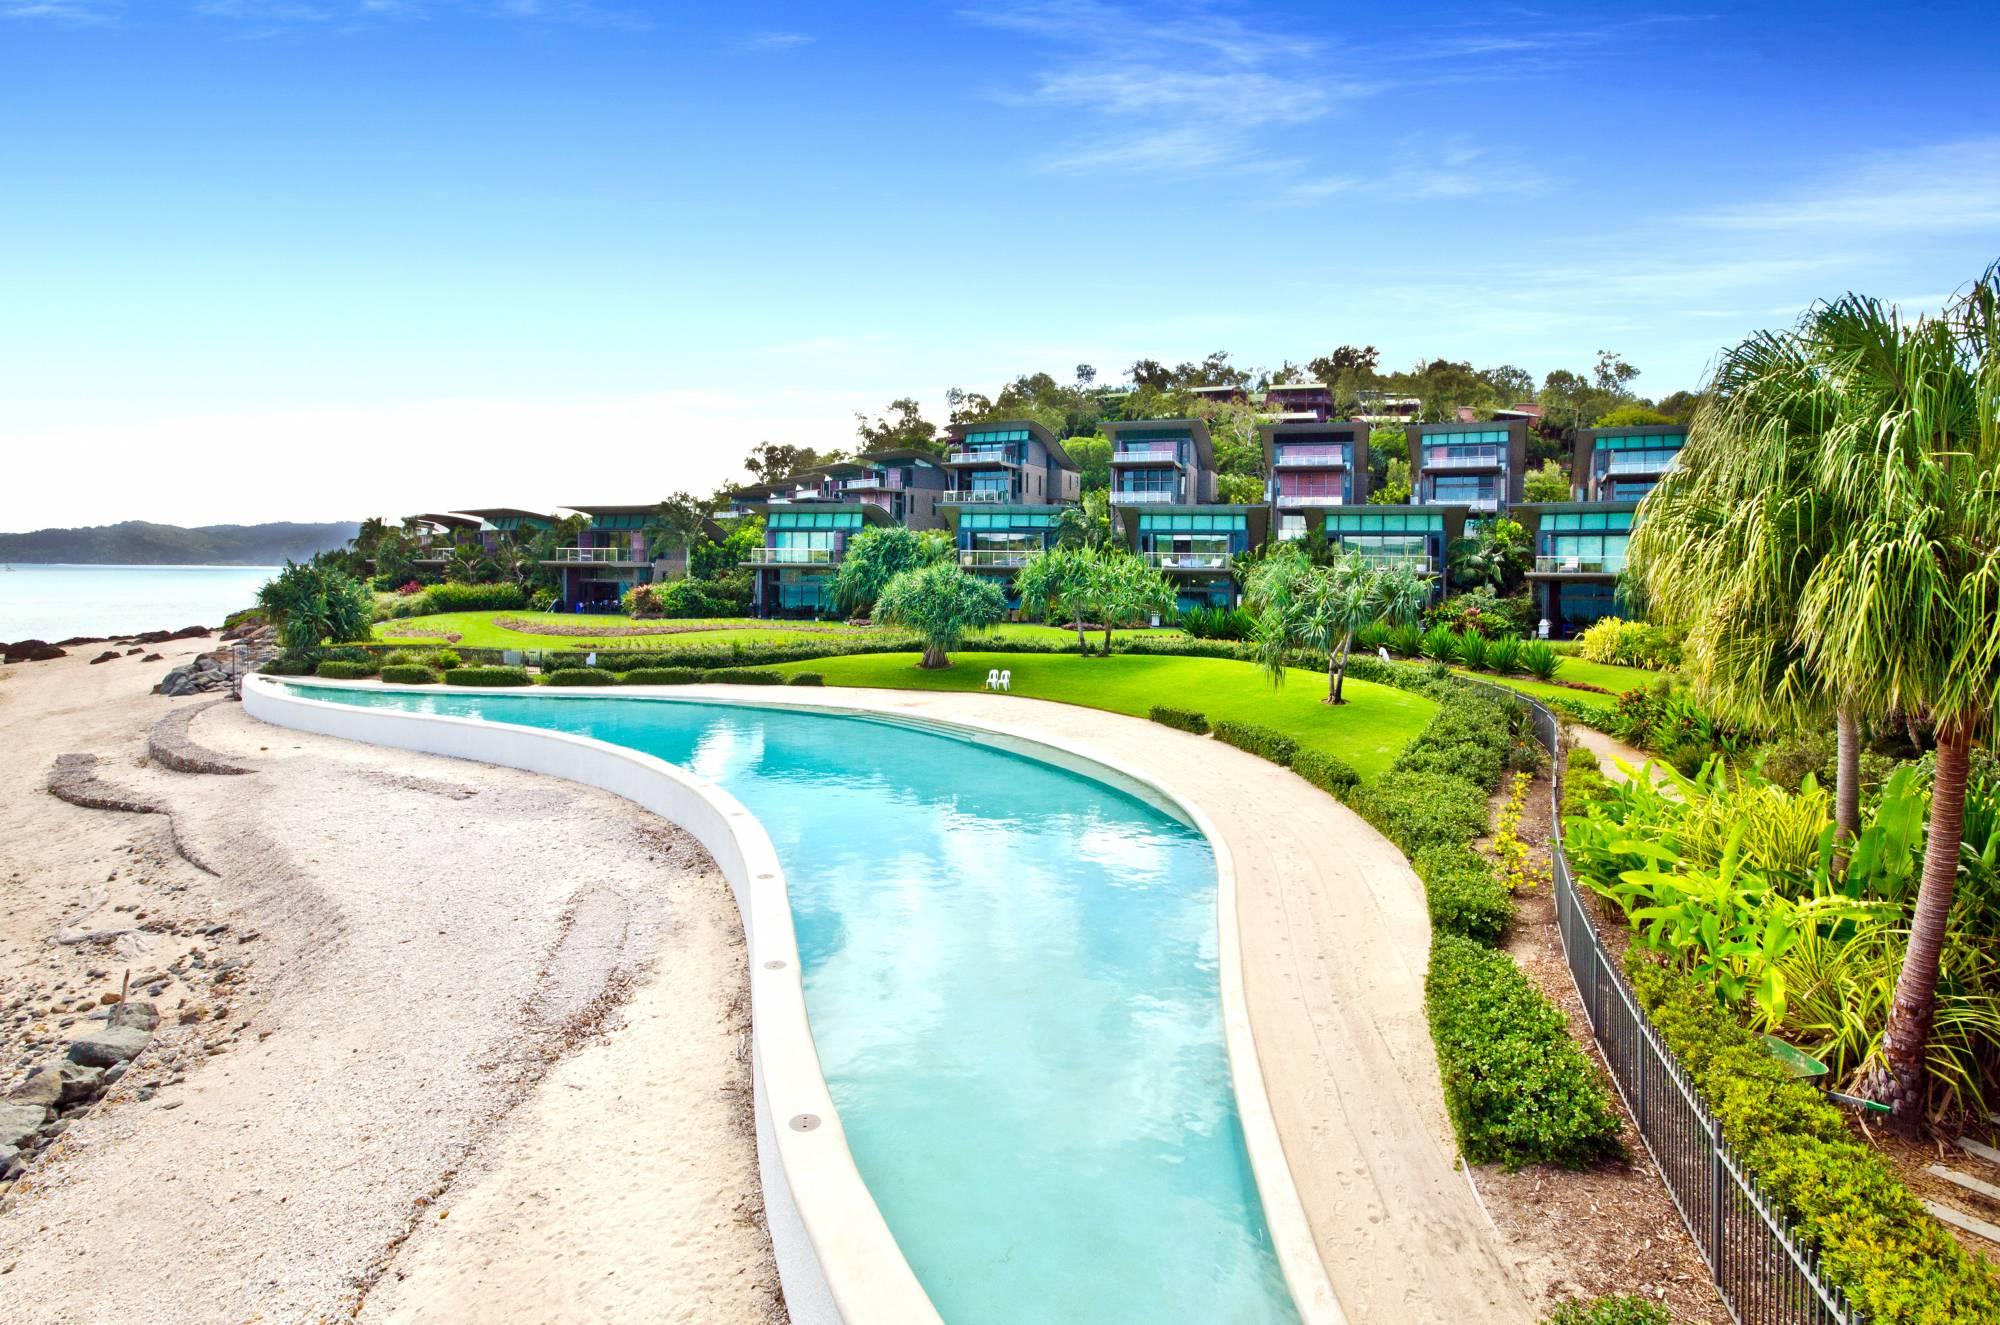 yacht club villa 28 luxury villa hamilton island. Black Bedroom Furniture Sets. Home Design Ideas